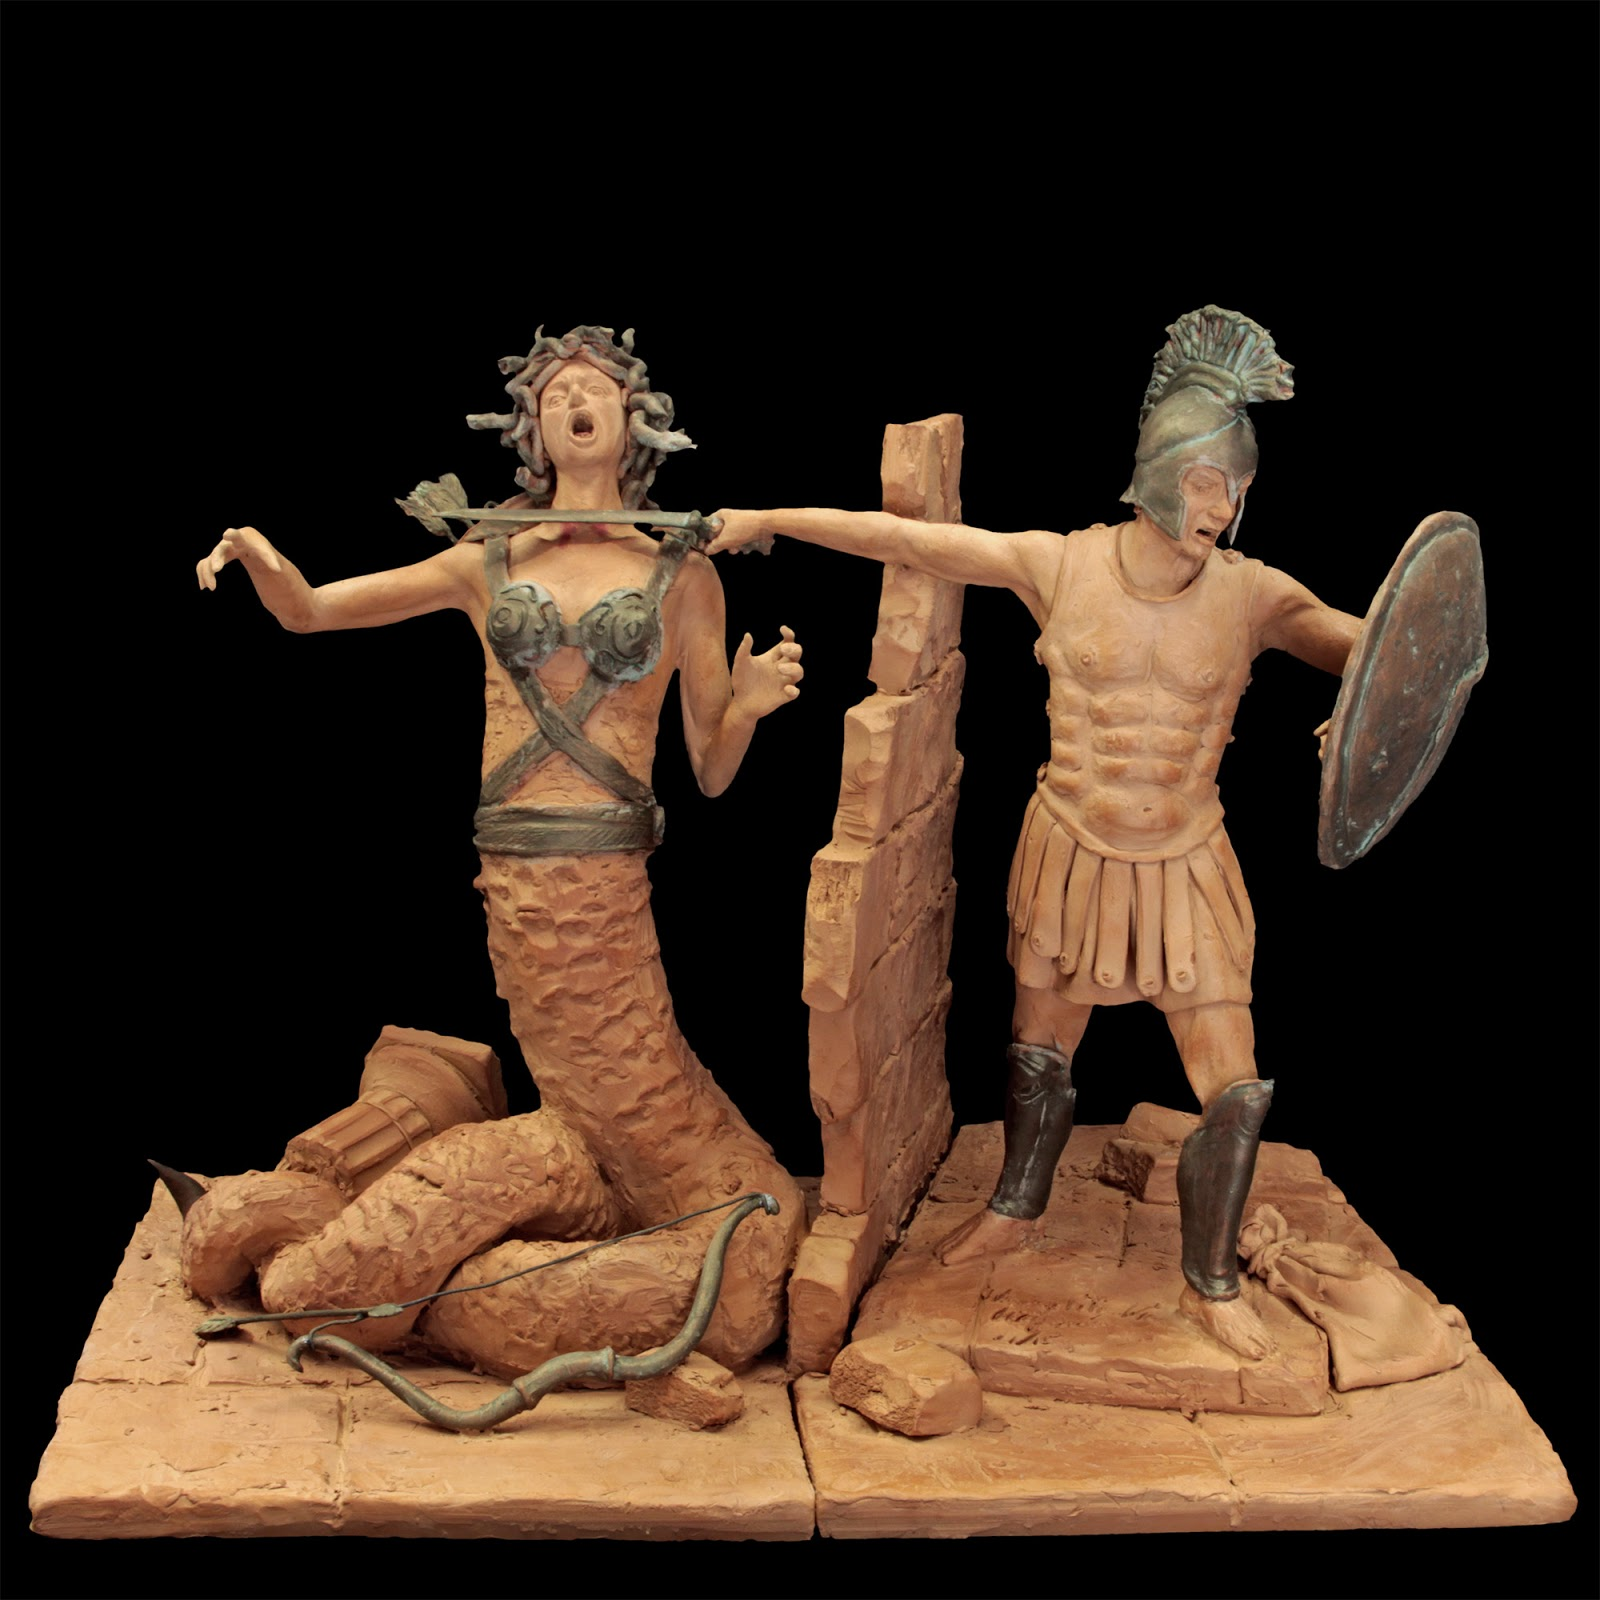 Risultati immagini per Perseo uccide Medusa immagini in jpg